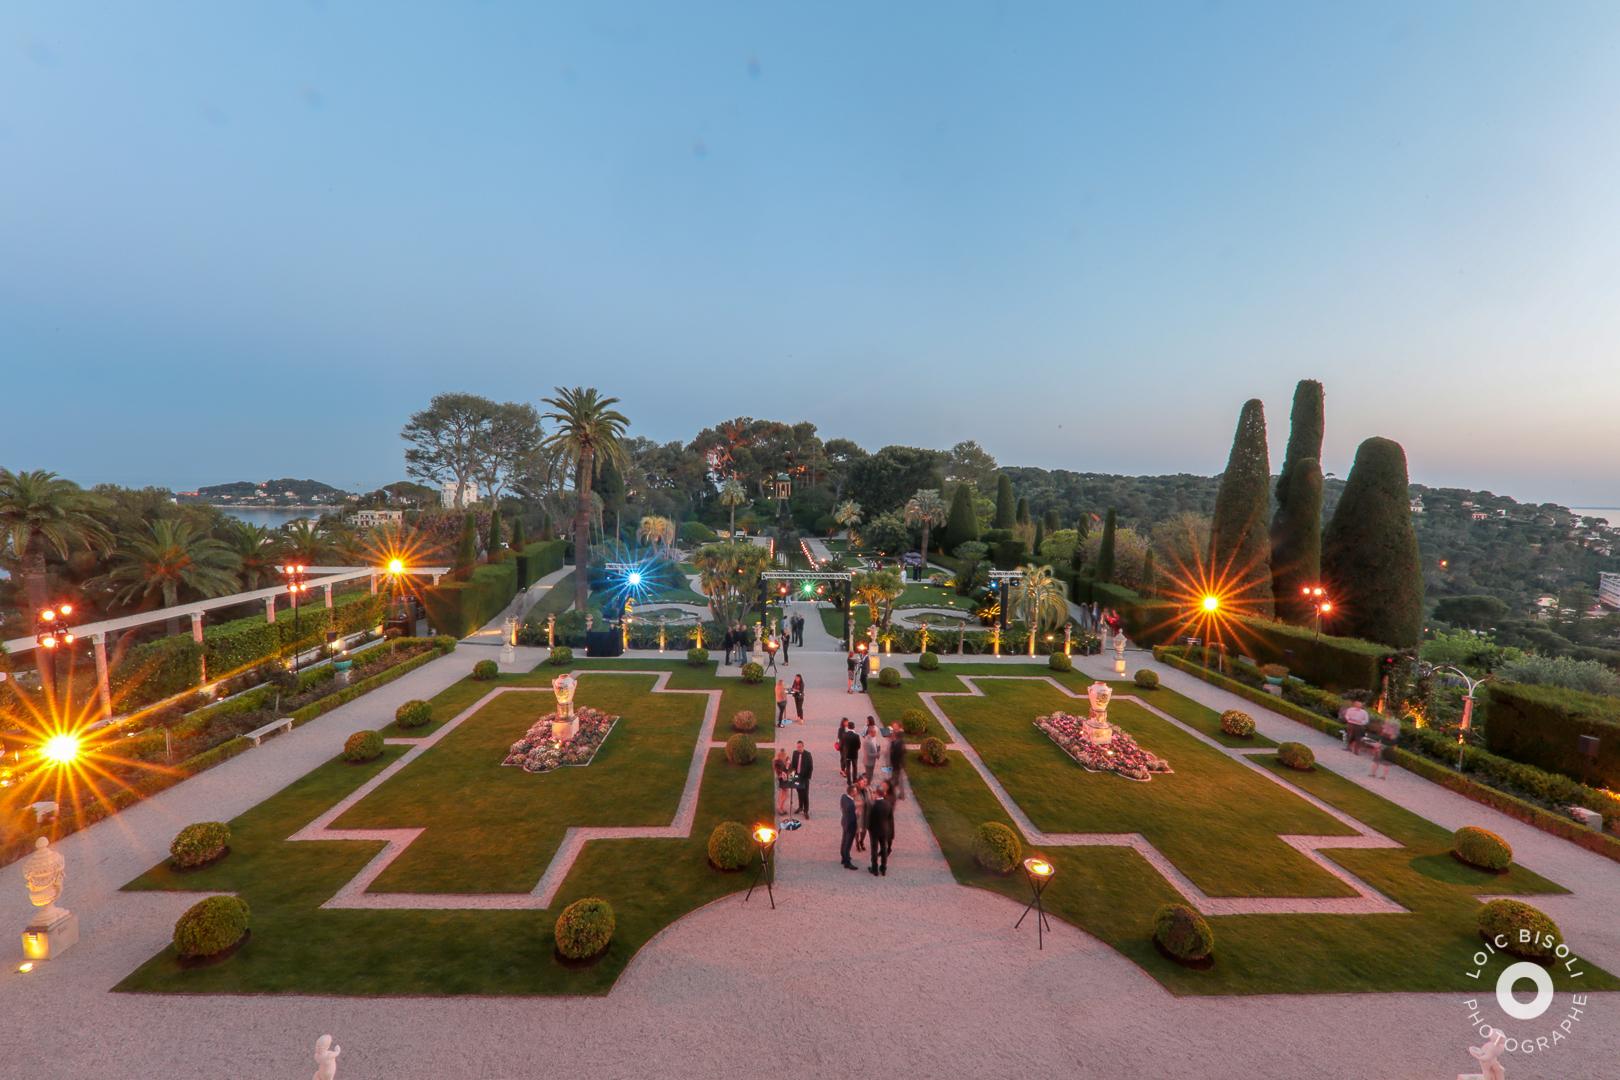 aucop-Villa Ephrussi de Rothschild-Studio Loic Bisoli-facade-nice-soiree-saint jean cap ferrat-evenement-lumieres-deco